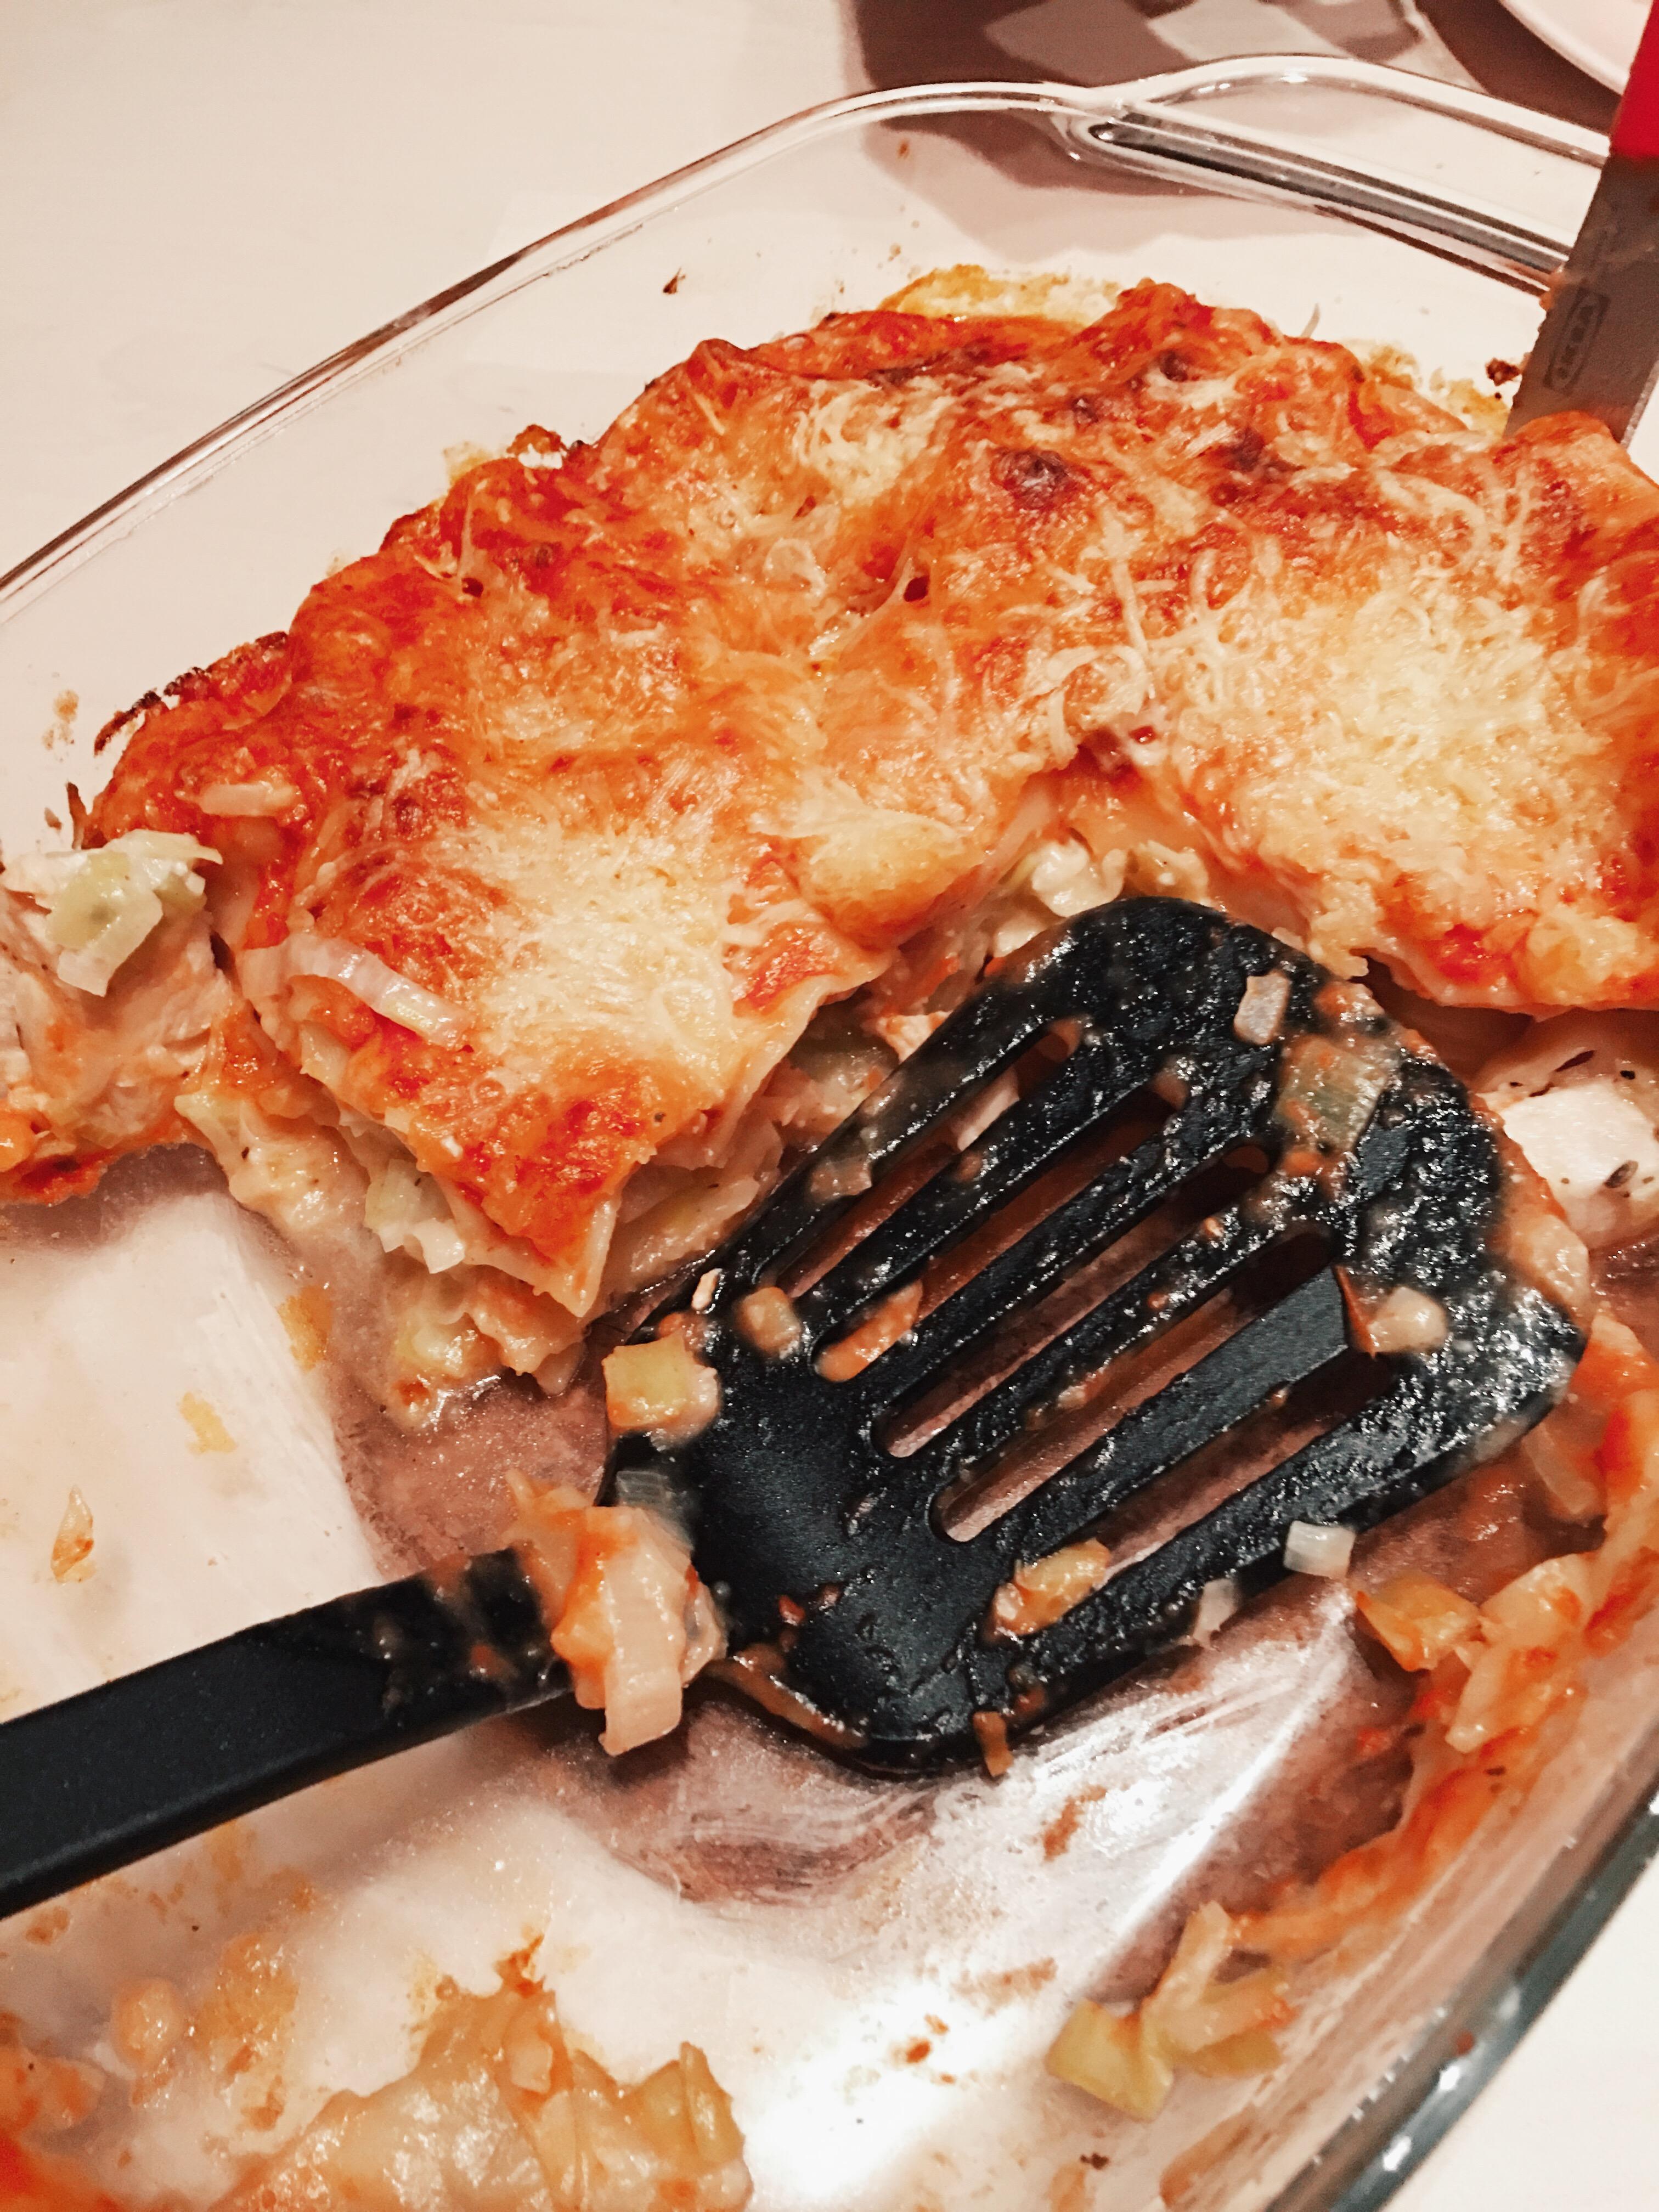 Recept | Soort van lasagne met prei en kip en tomatensaus.